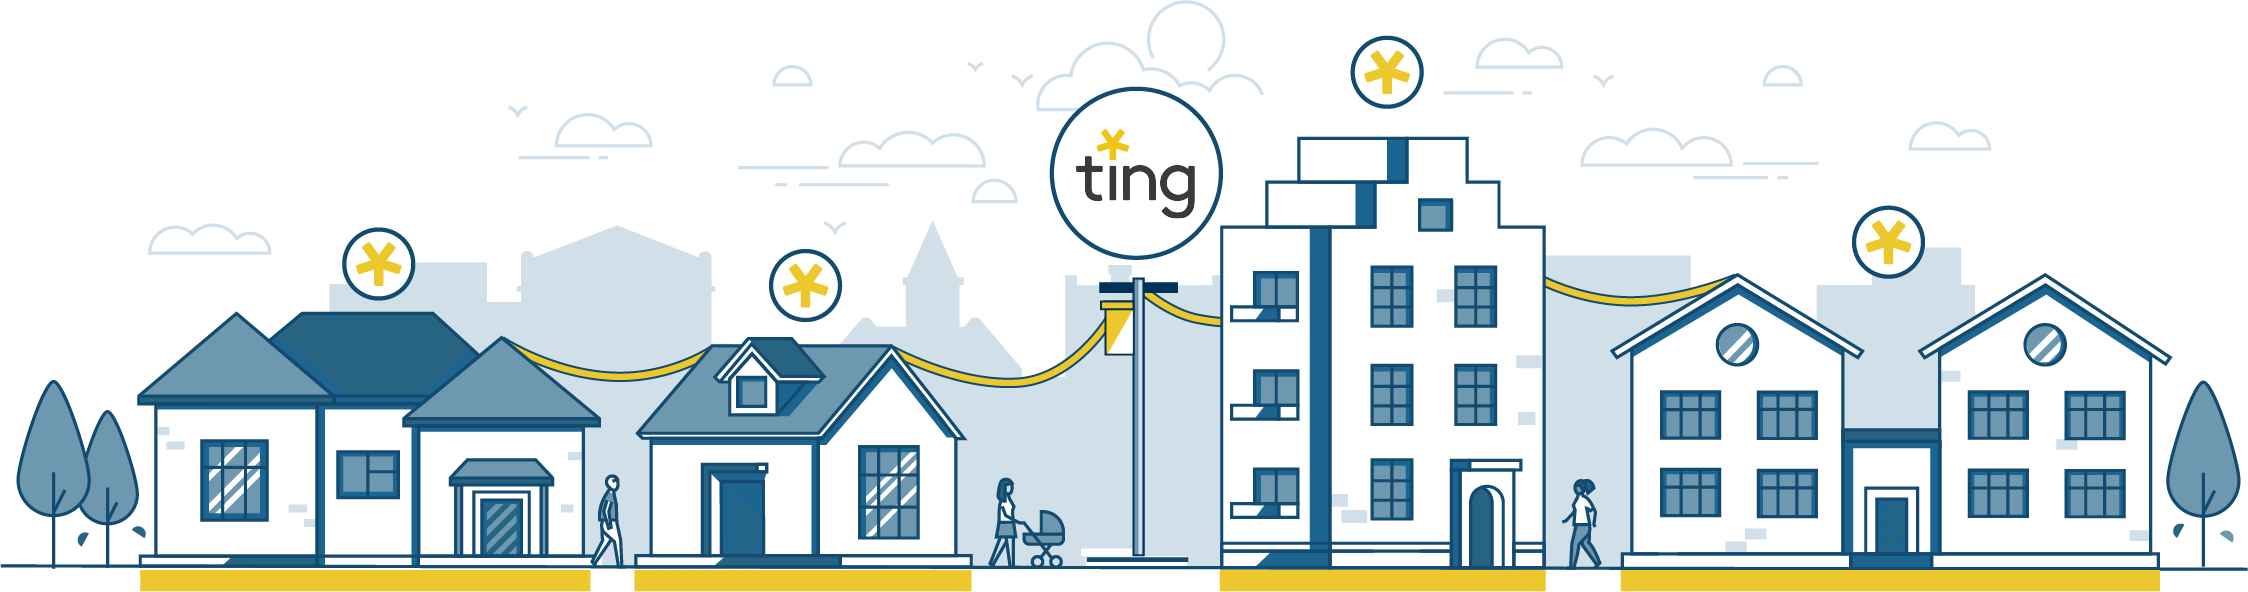 Ting Neighborhood Connectivity transparent